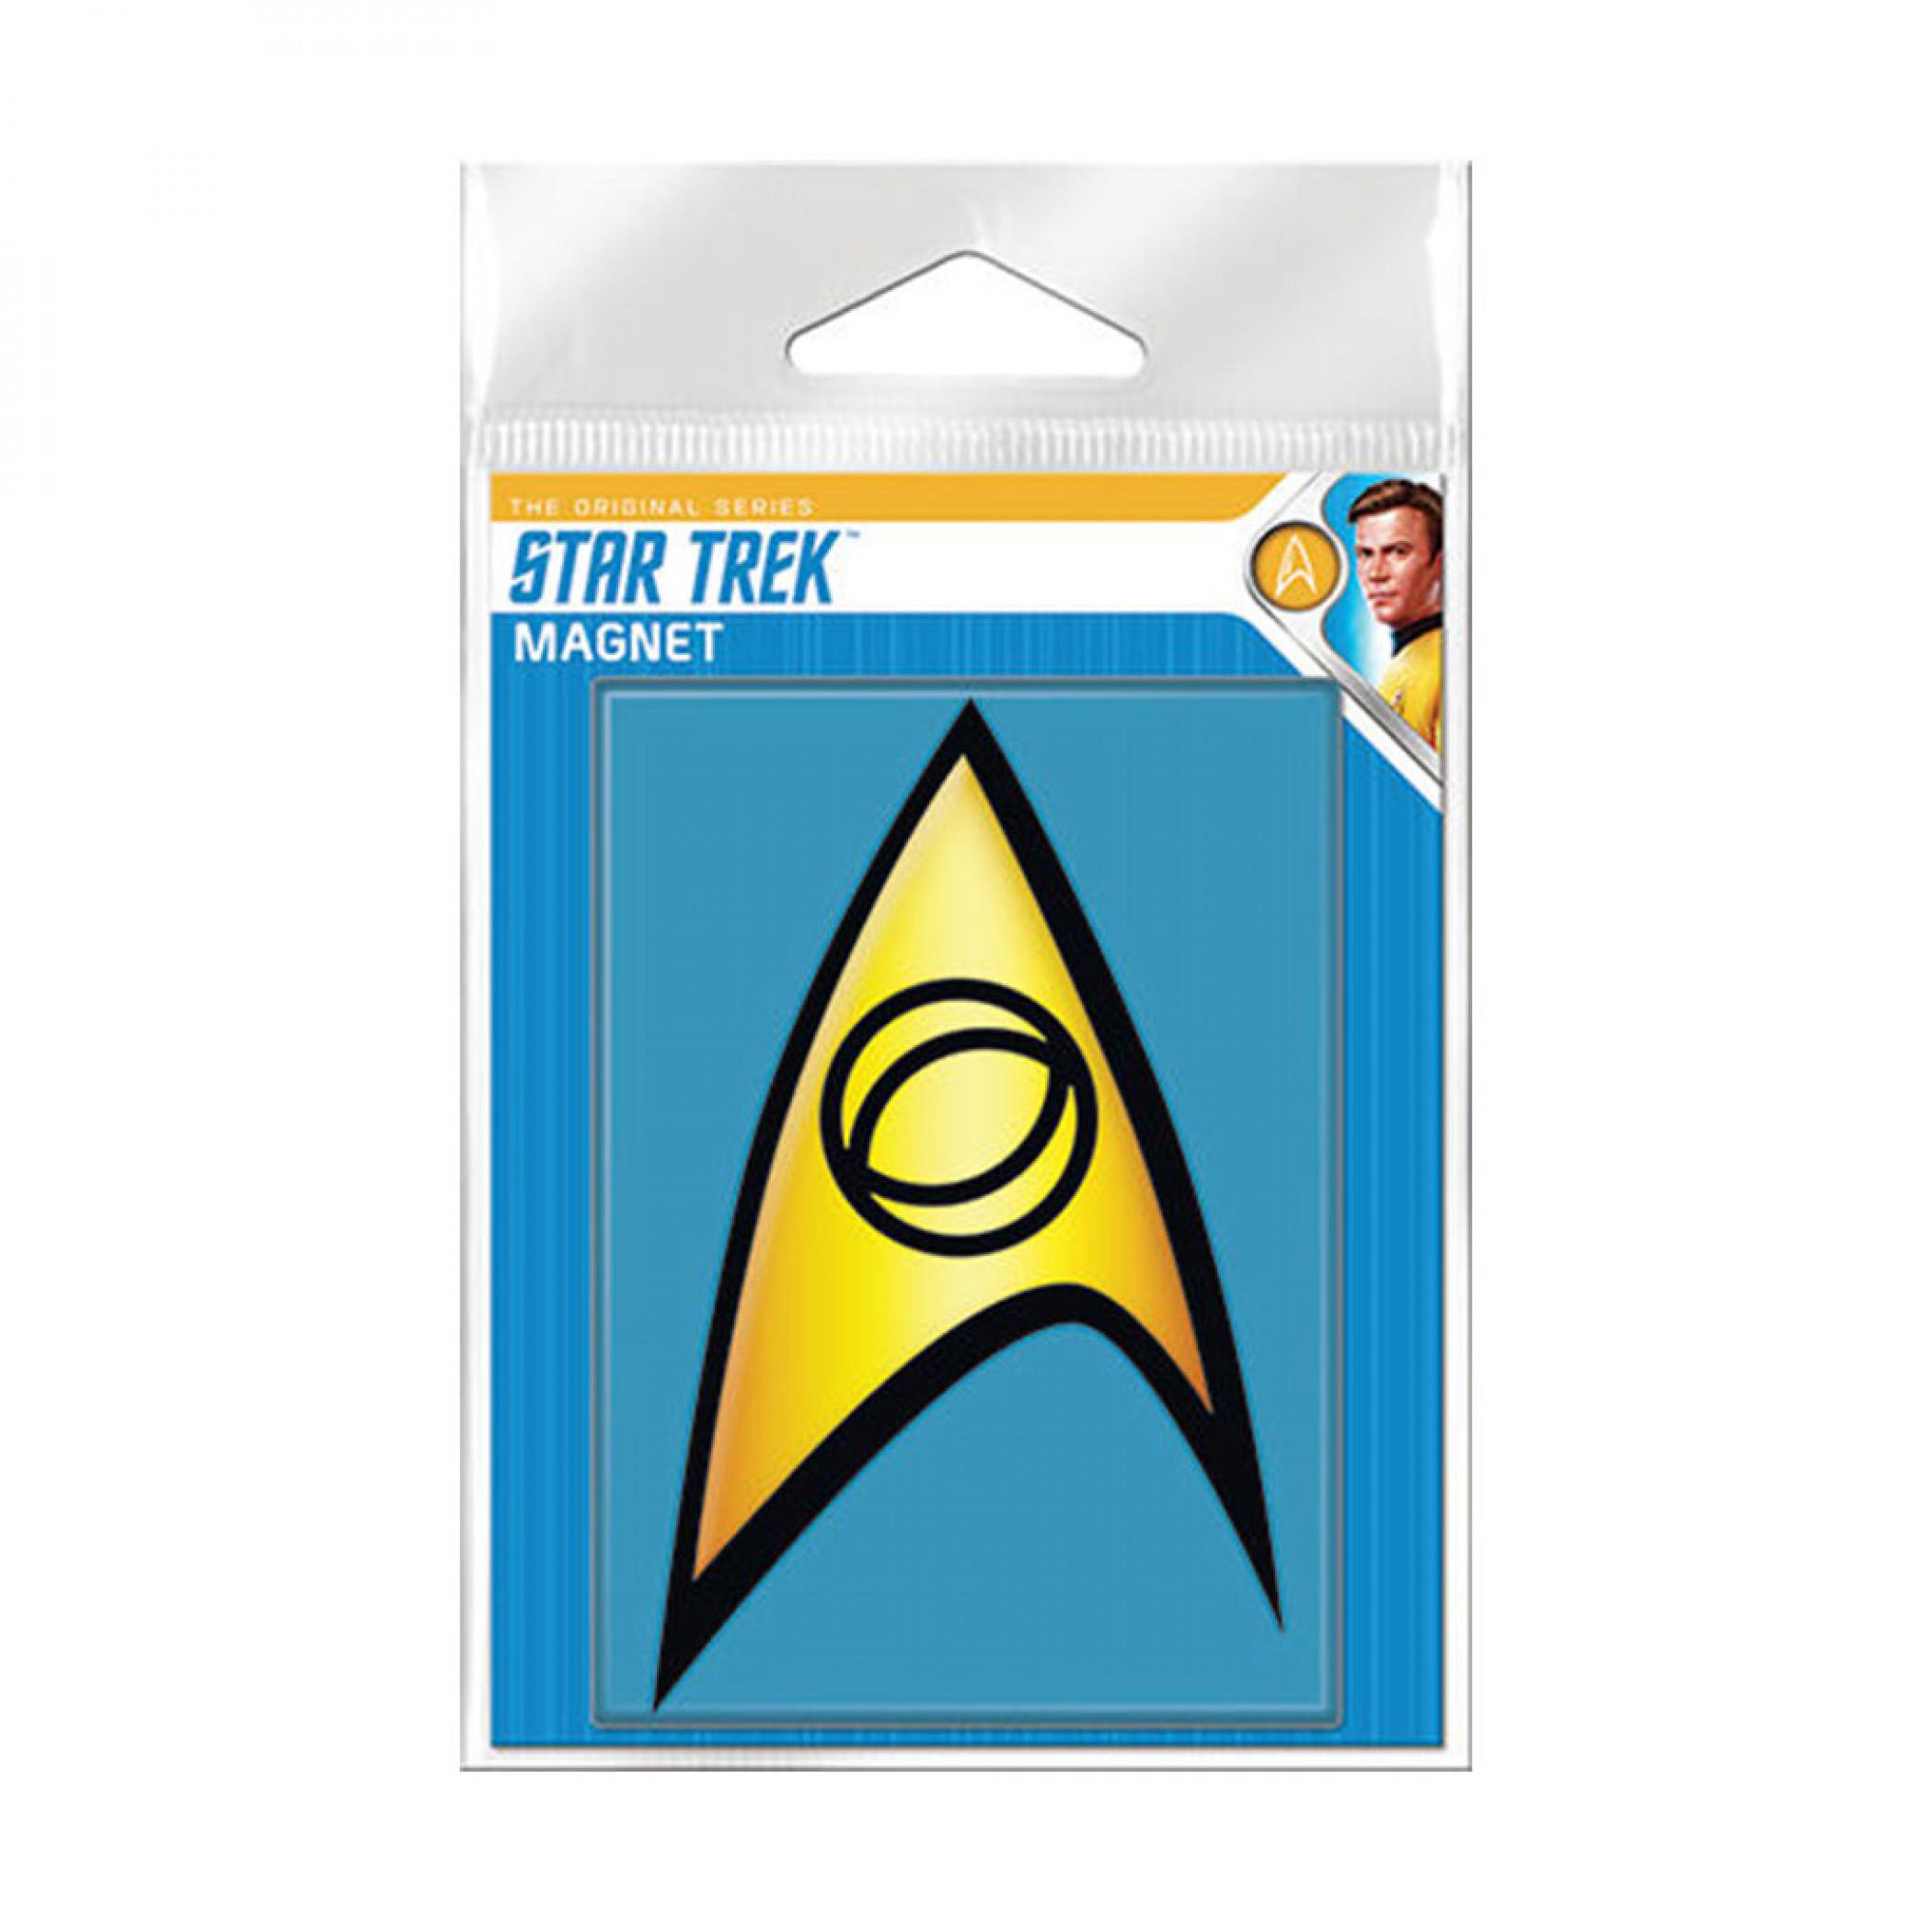 Star Trek Starfleet Science Badge Carded Magnet